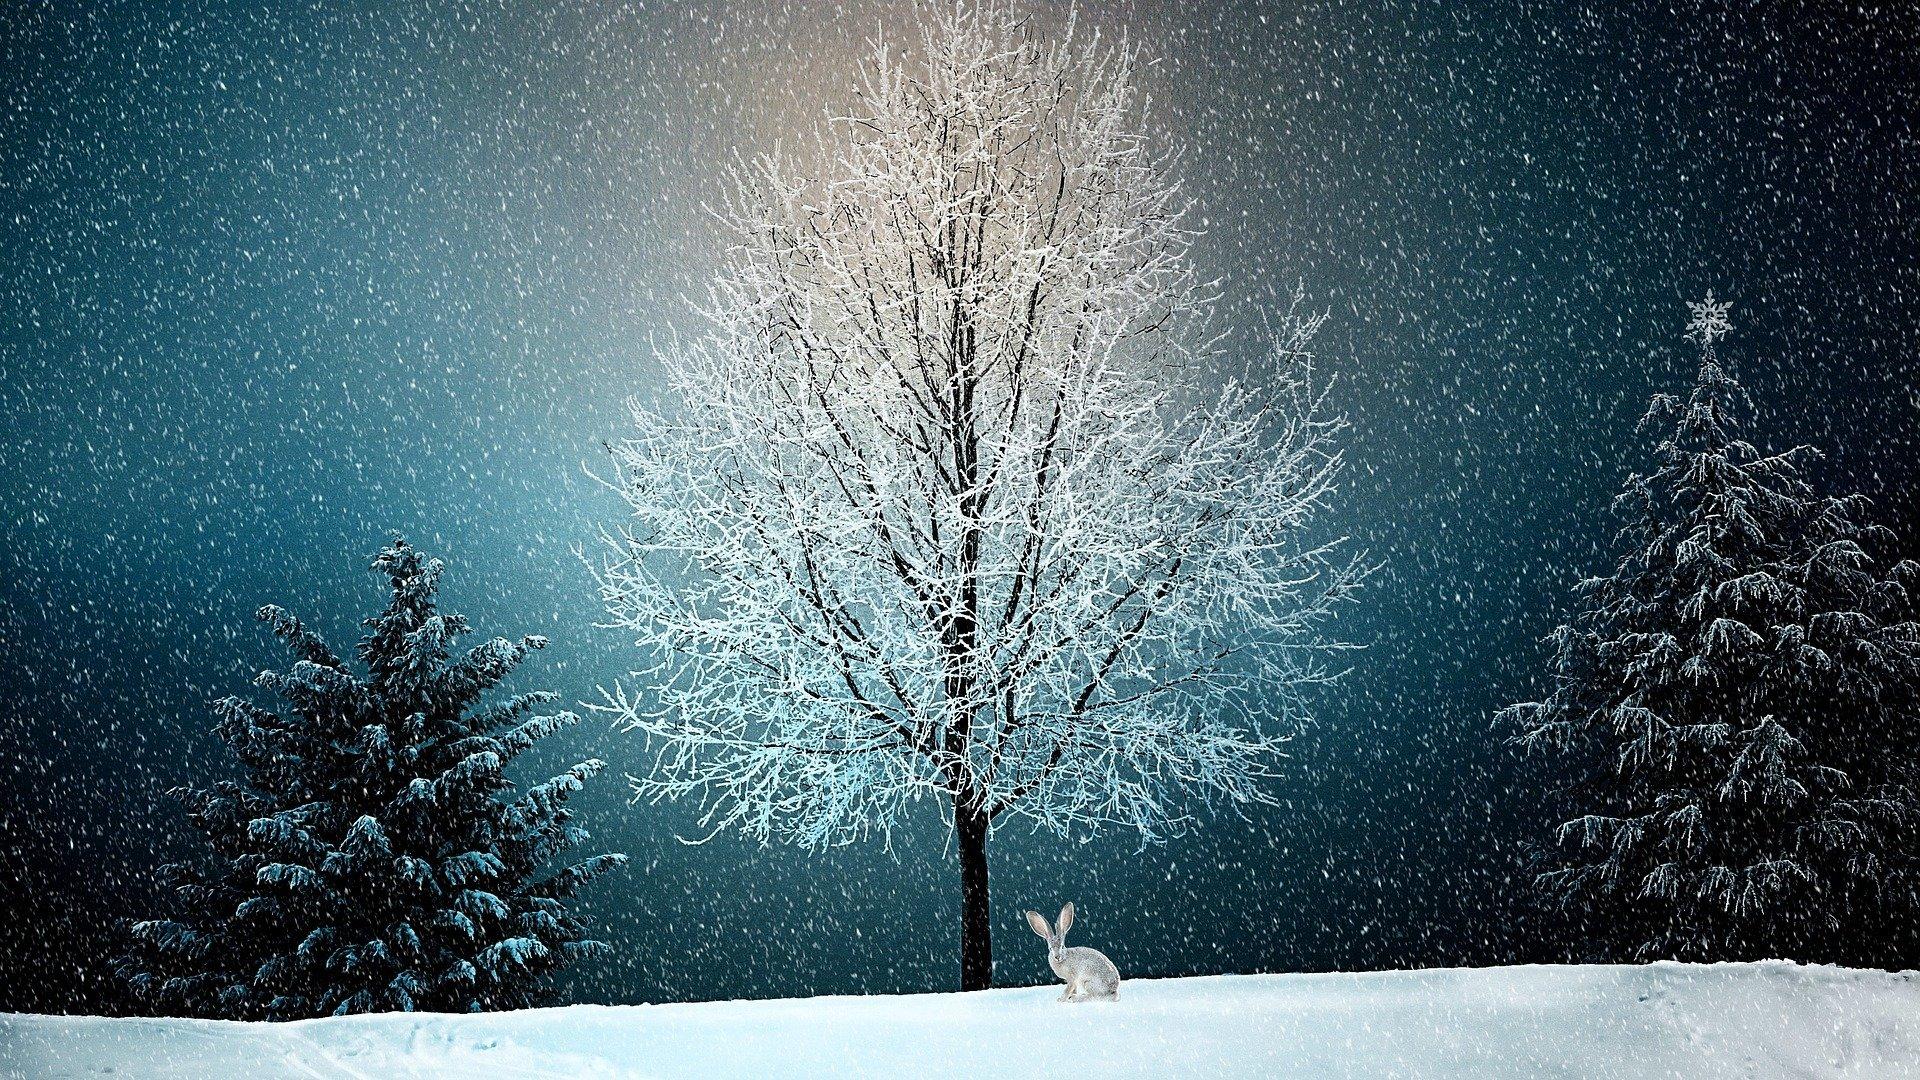 piosenka Zima zima zima pada pada śnieg, tekst i melodia